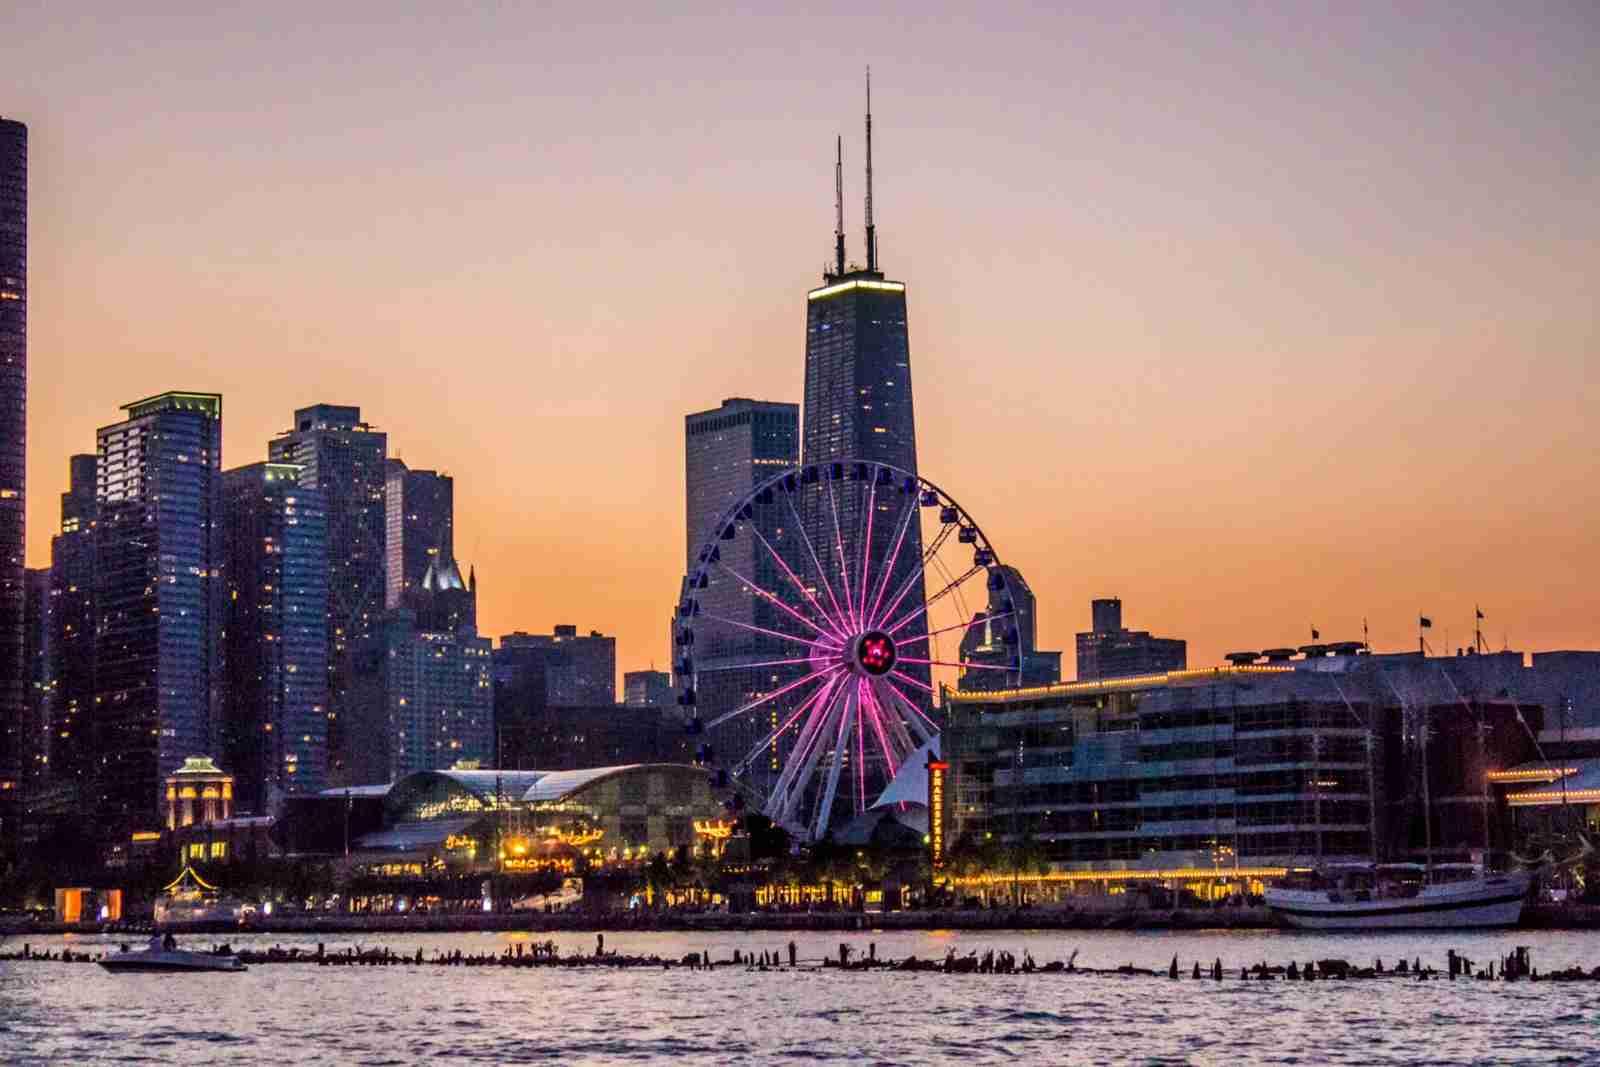 A view at dusk of the Centennial Wheel on Navy Pier. (Photo by Gautam Krishnan / Unsplash)